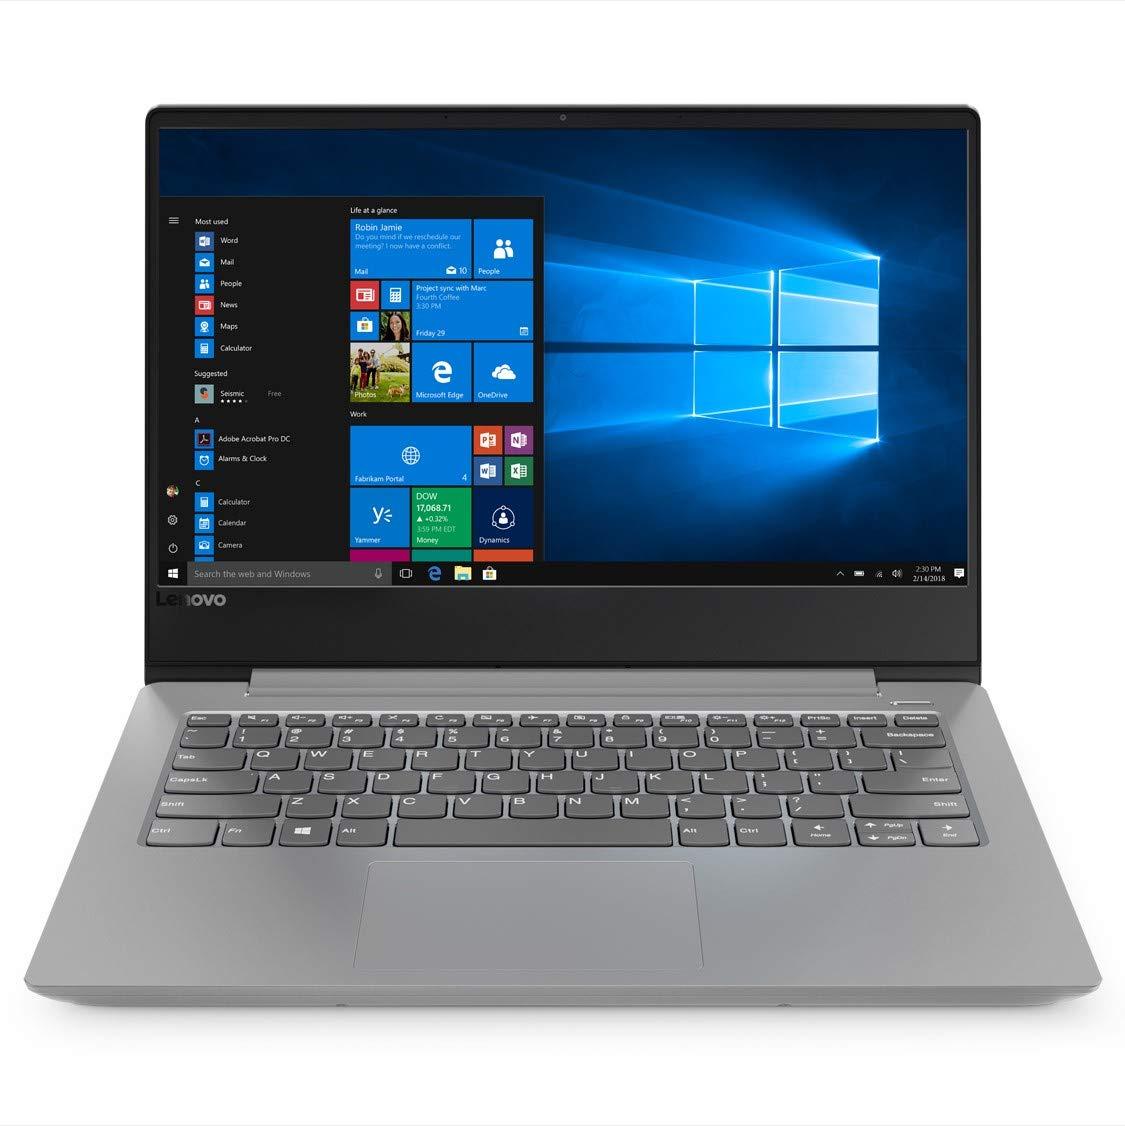 Lenovo Ideapad 330s Intel Core i3 8th Gen 14-inch Full HD Thin & Light Laptop (4GB RAM/1TB HDD/Windows 10 Home / Platinum Grey /1.6kg), 81F40196IN